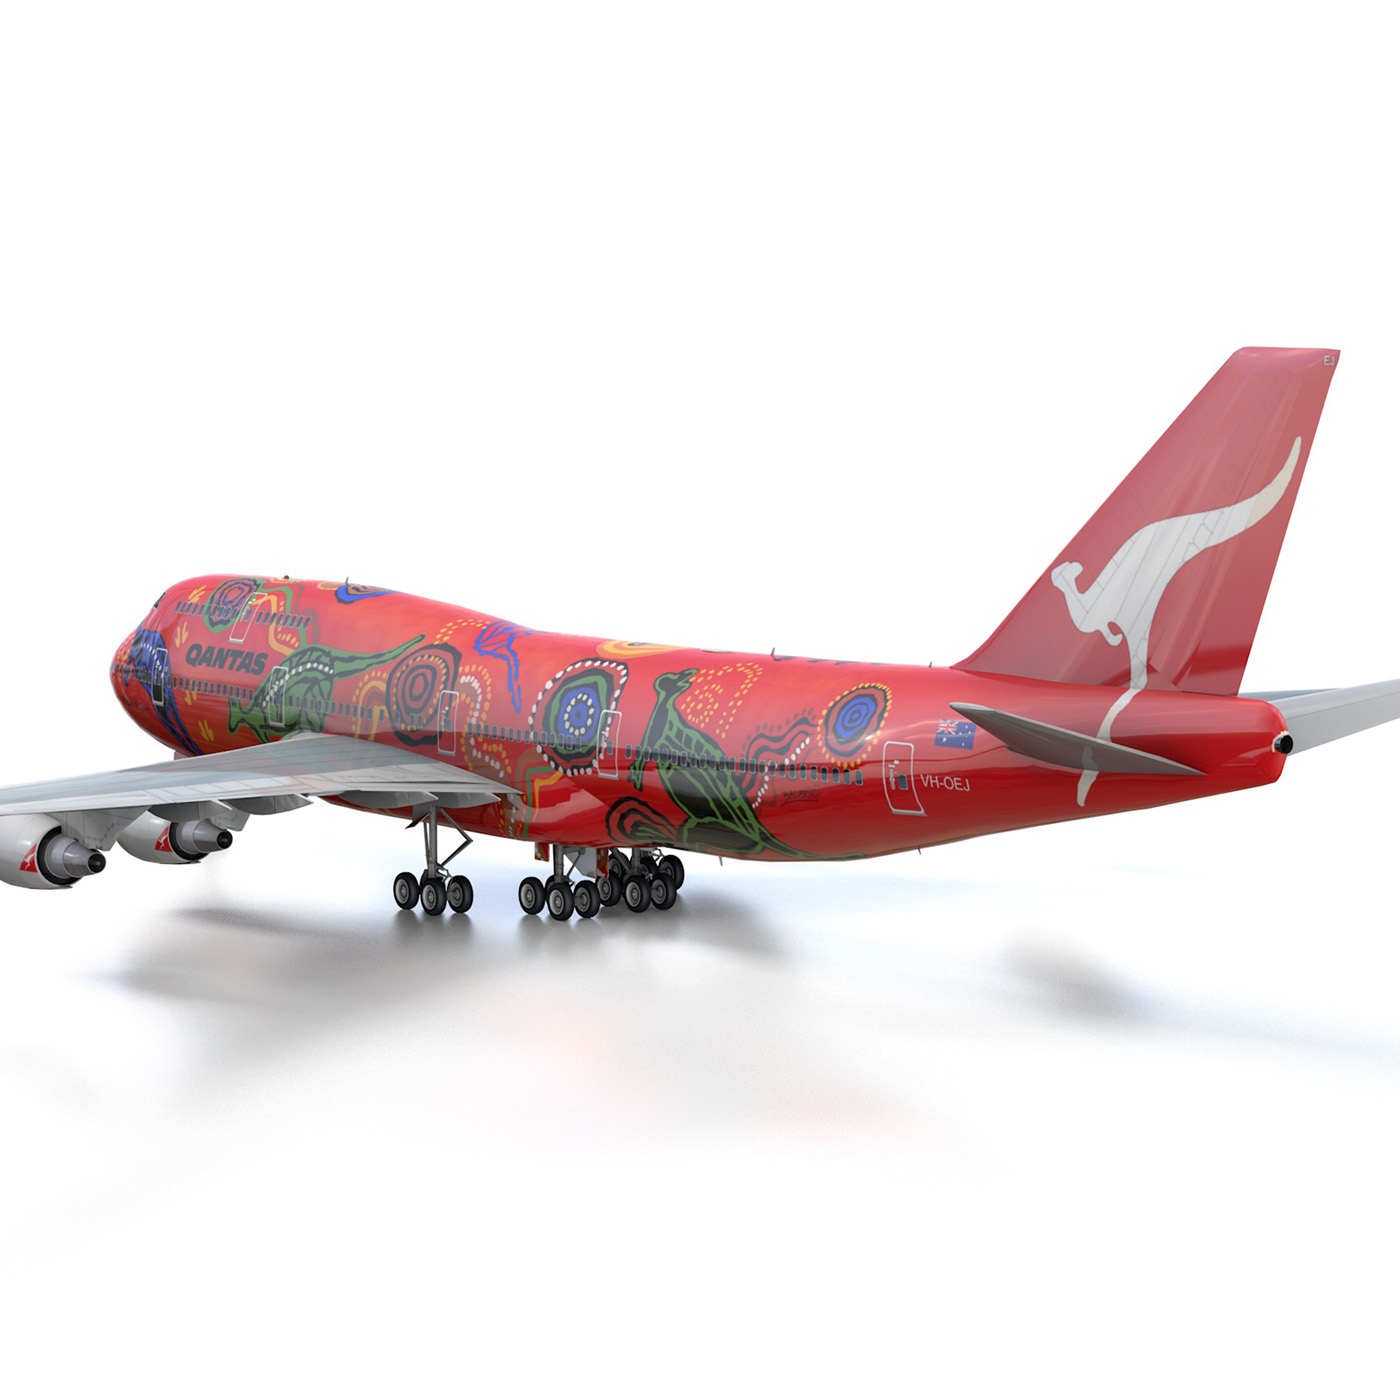 boeing 747 qantas wunala dreaming 3d model 3ds fbx c4d lwo obj 281790